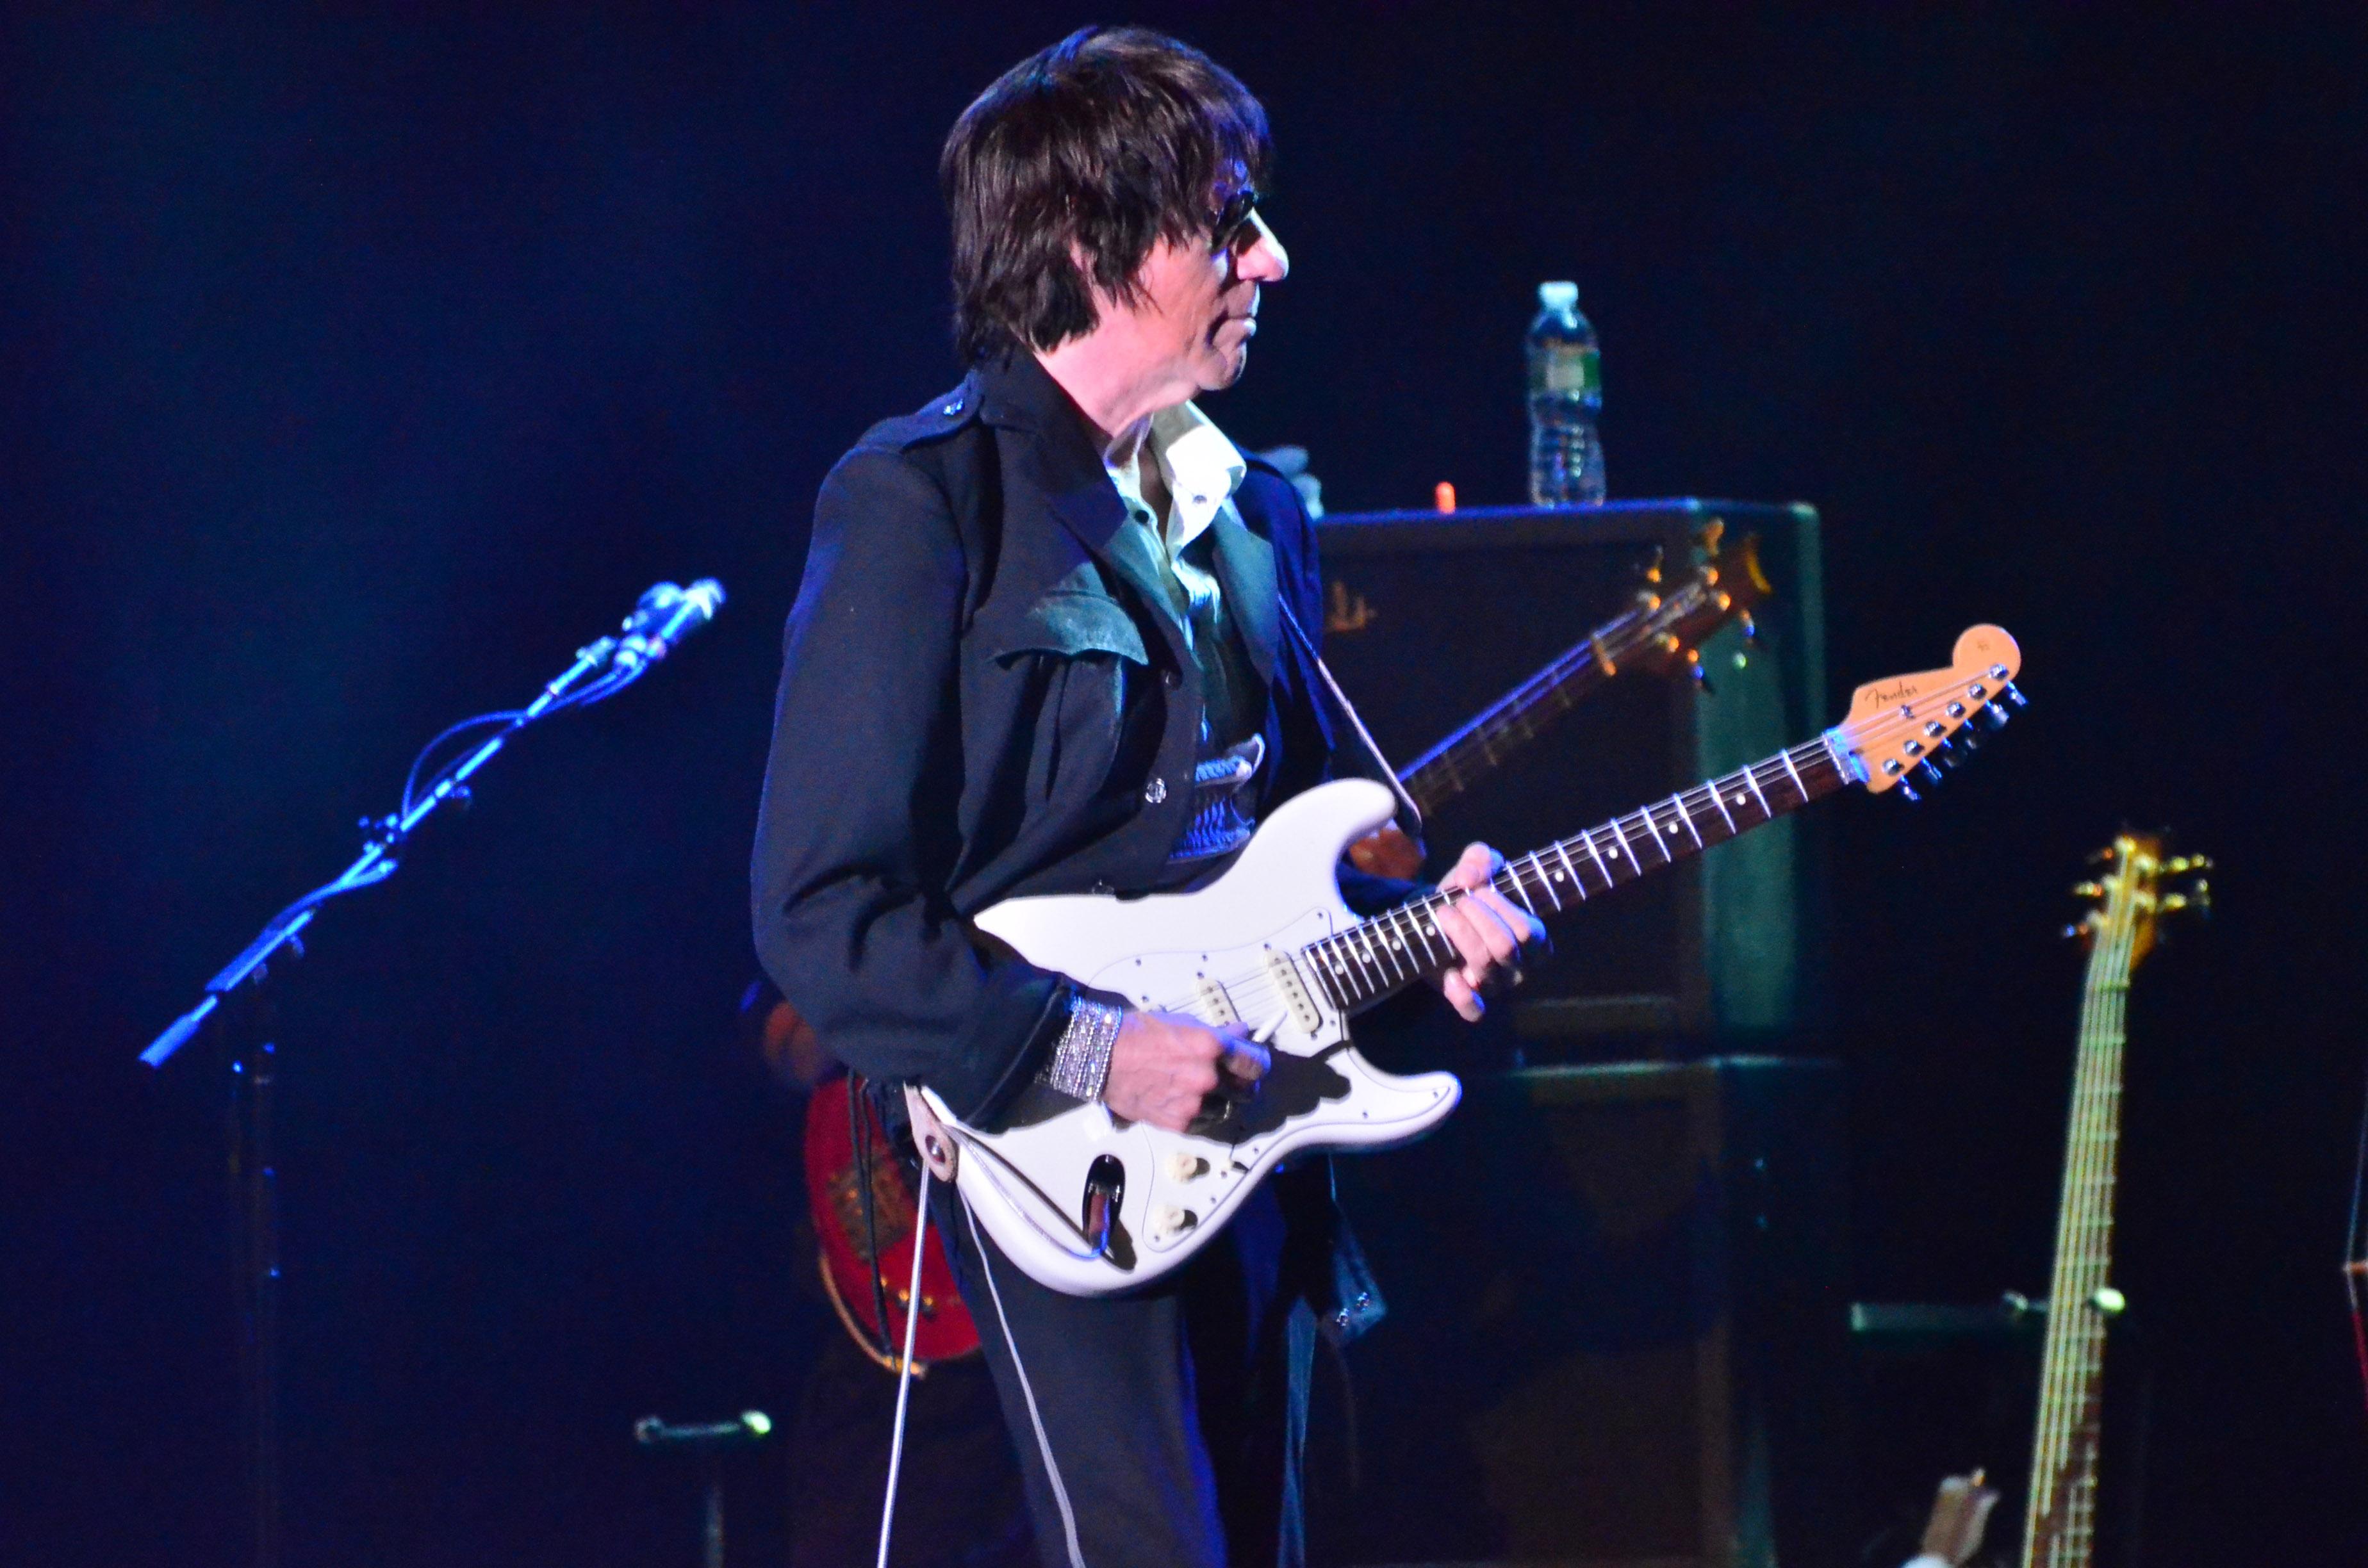 Jeff Beck at the Paramount in Huntington, ny on 4/15/2015.